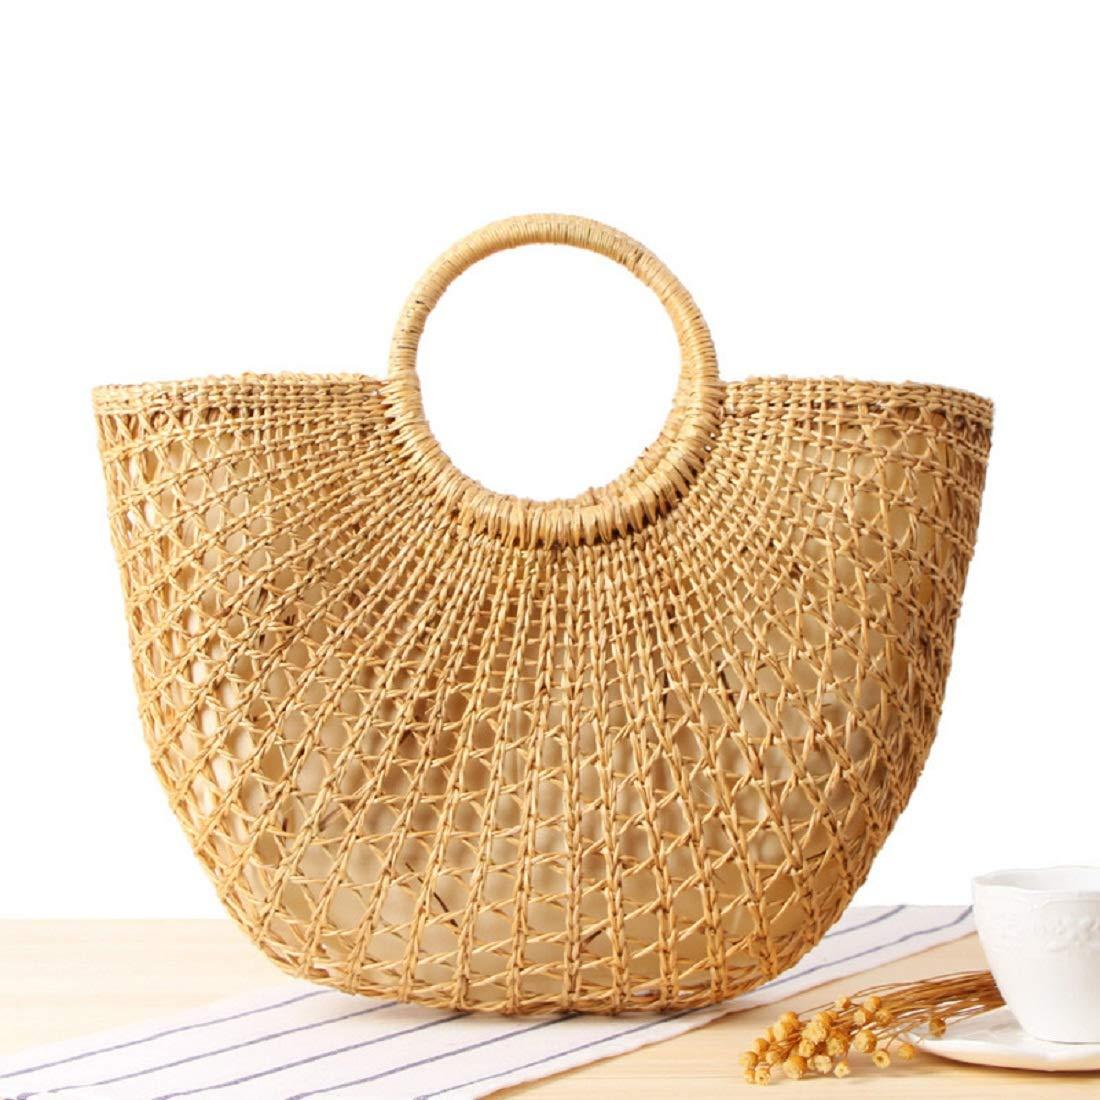 EROUGE Handmade Straw Bag Retro Woven Shoulder Bag Women Rattan Tote Hobo Top-handle Bags (3)